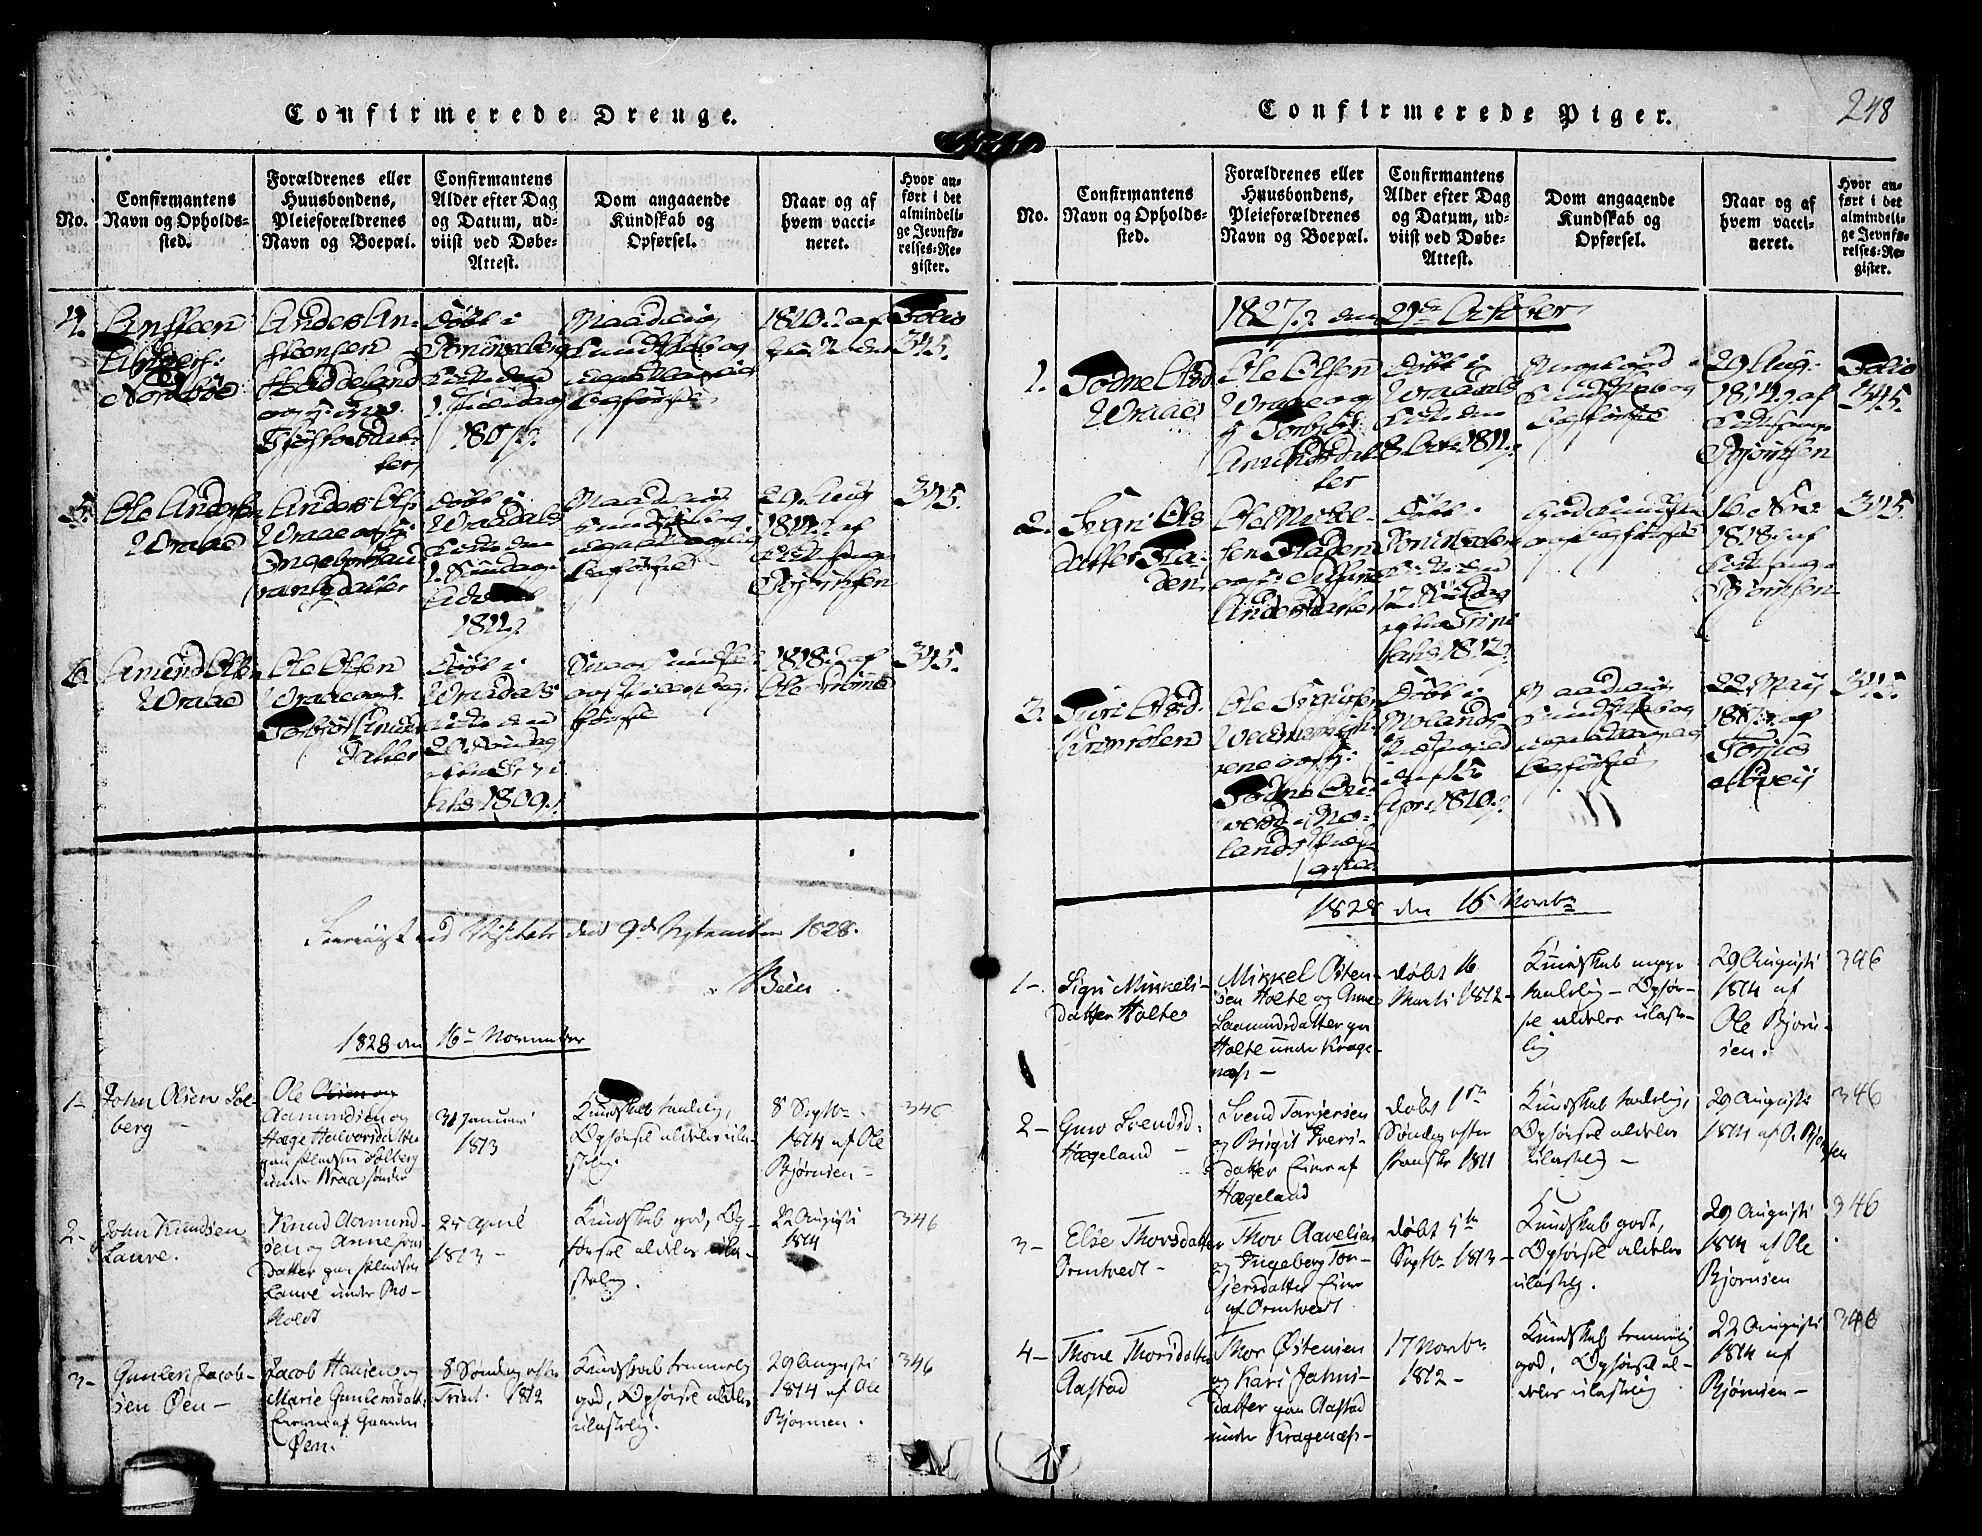 SAKO, Kviteseid kirkebøker, F/Fc/L0001: Ministerialbok nr. III 1, 1815-1836, s. 248